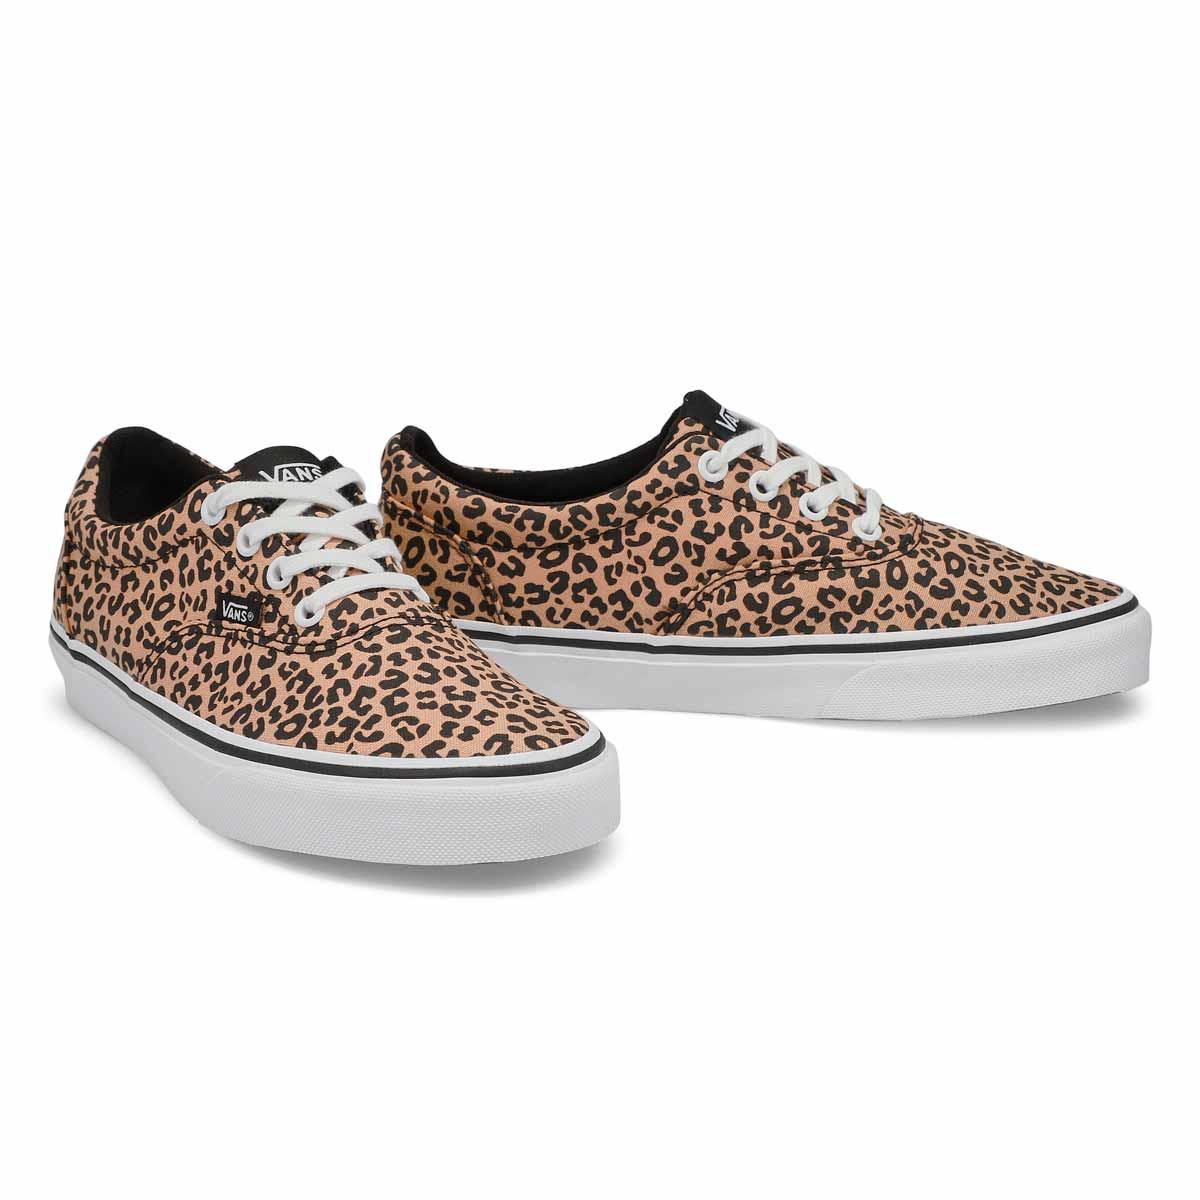 Women's DOHENY Sneaker - Cheetah/Blk/White